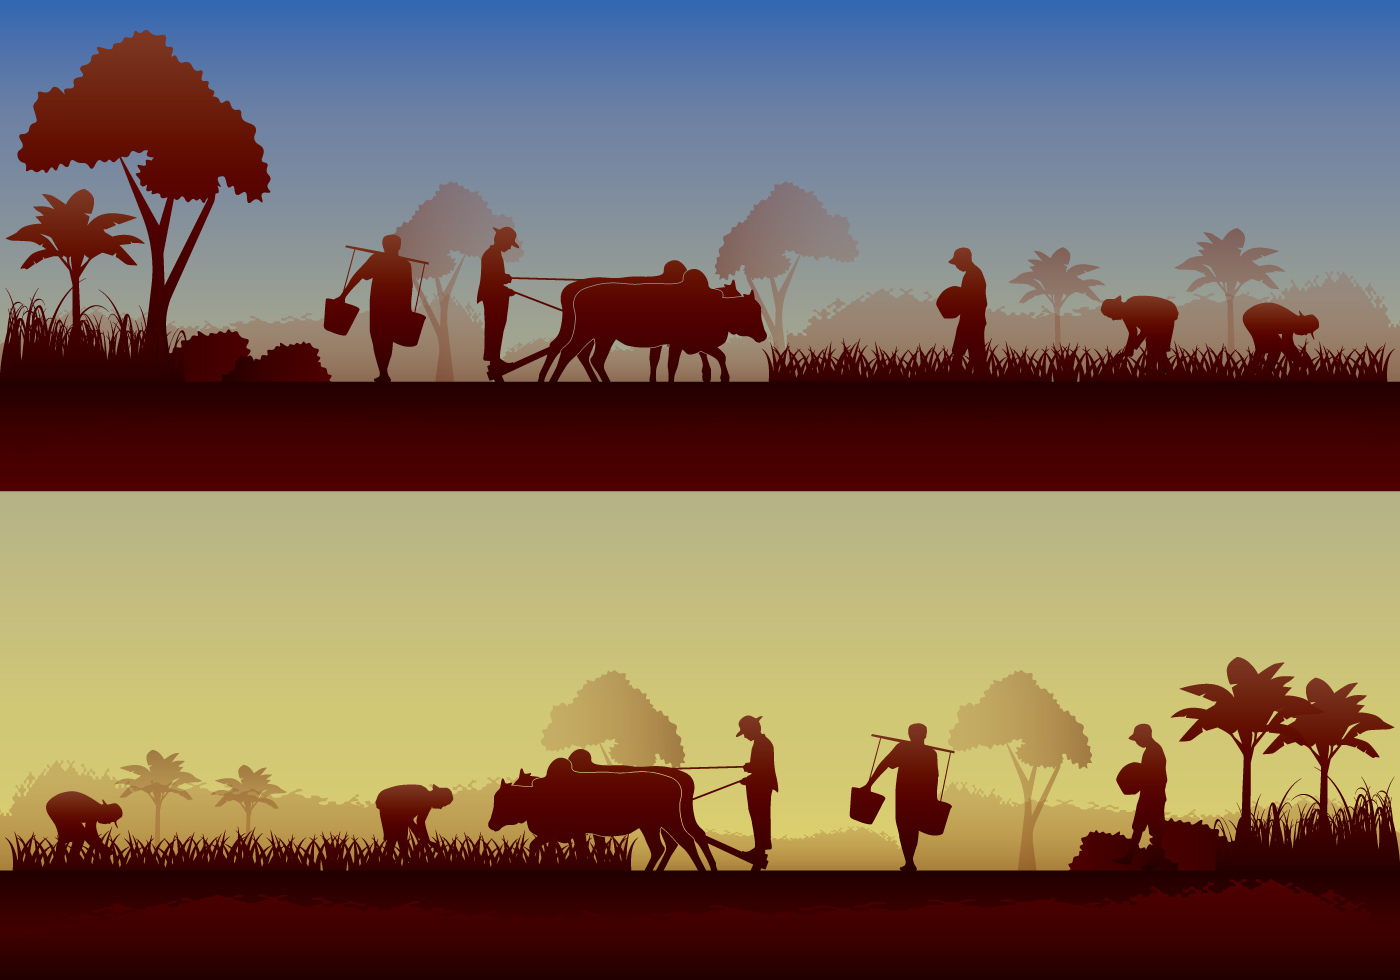 asian farmer silhouette download free vector art stock